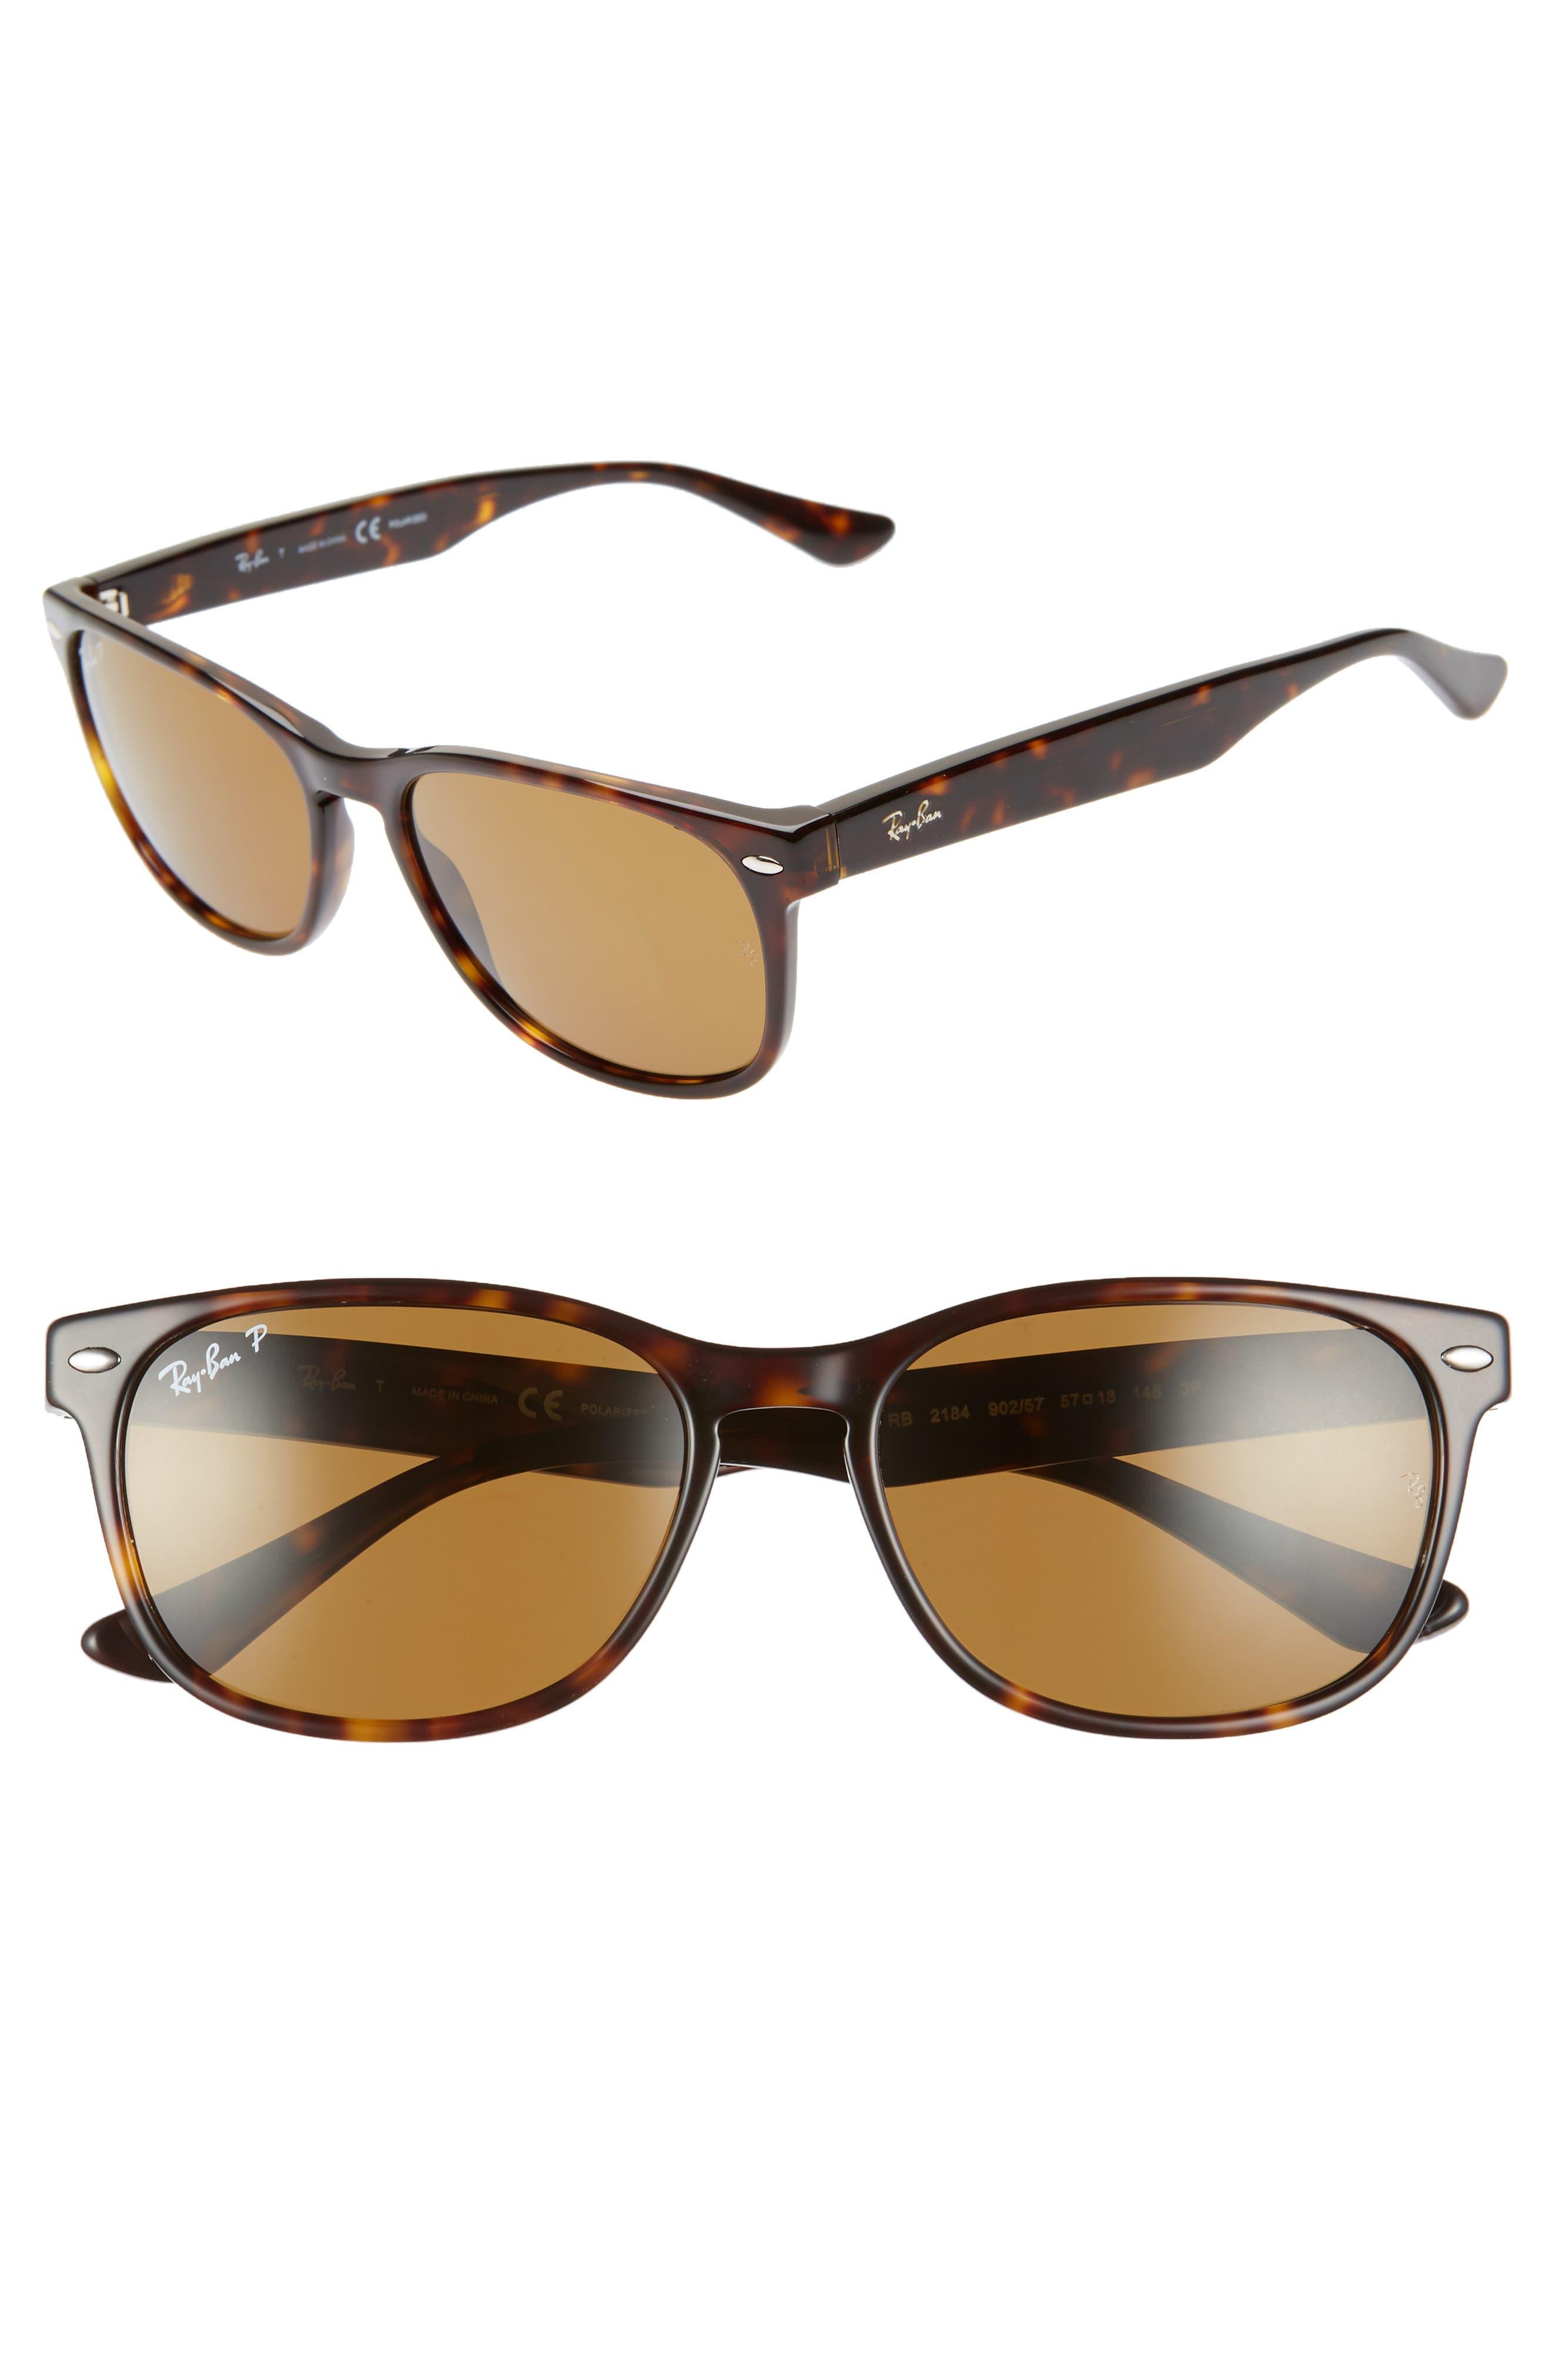 Ray-Ban Wayfarer 57Mm Polarized Sunglasses - Havana